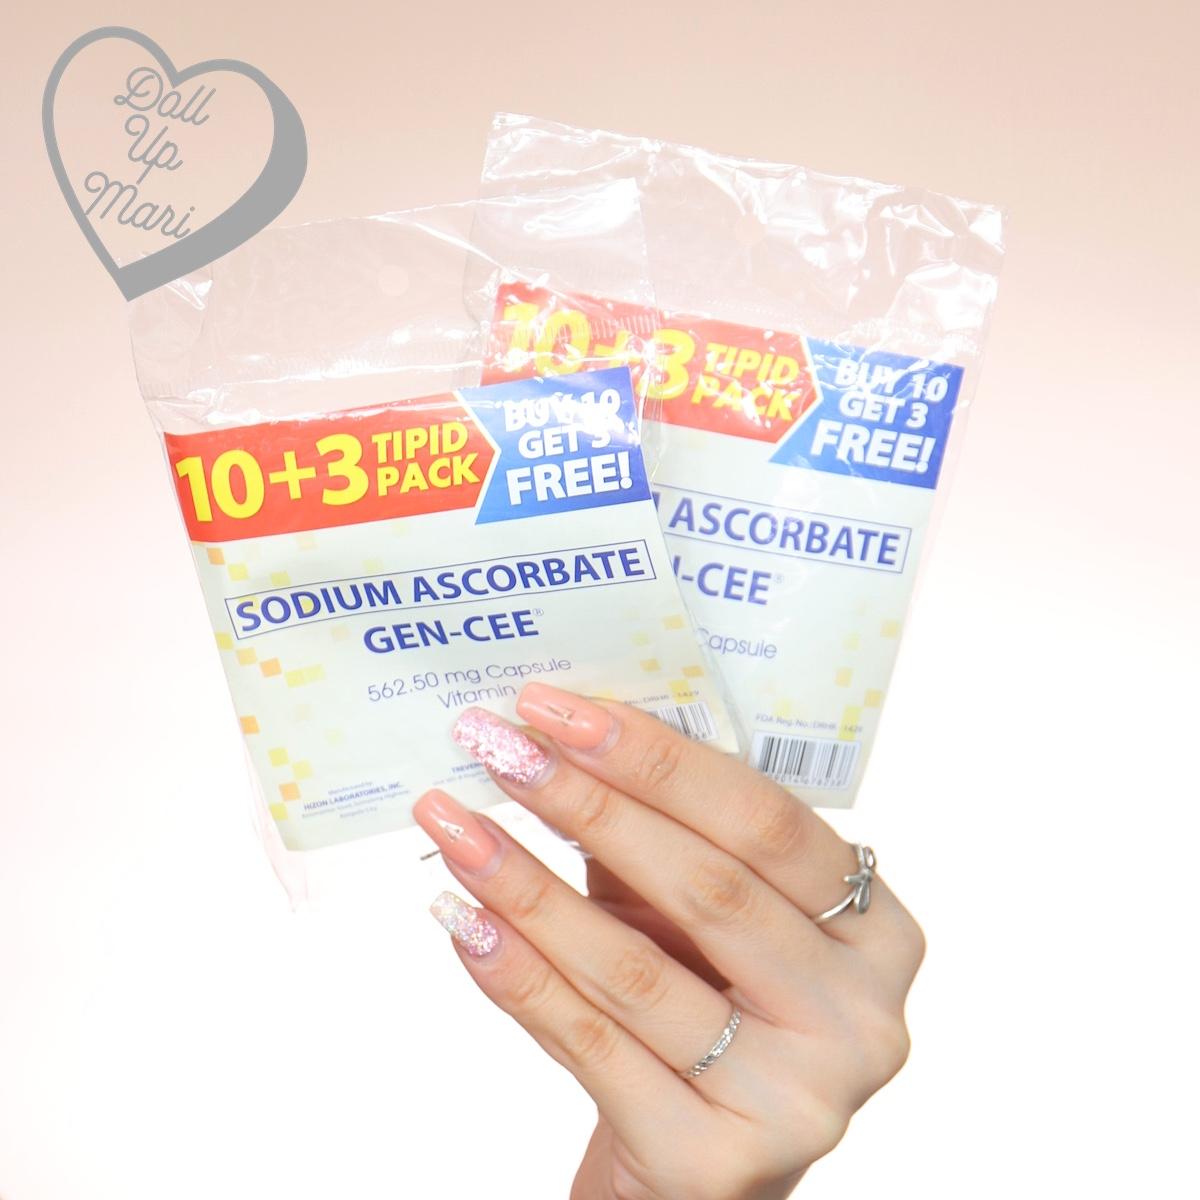 Gen-Cee (Sodium Ascorbate)